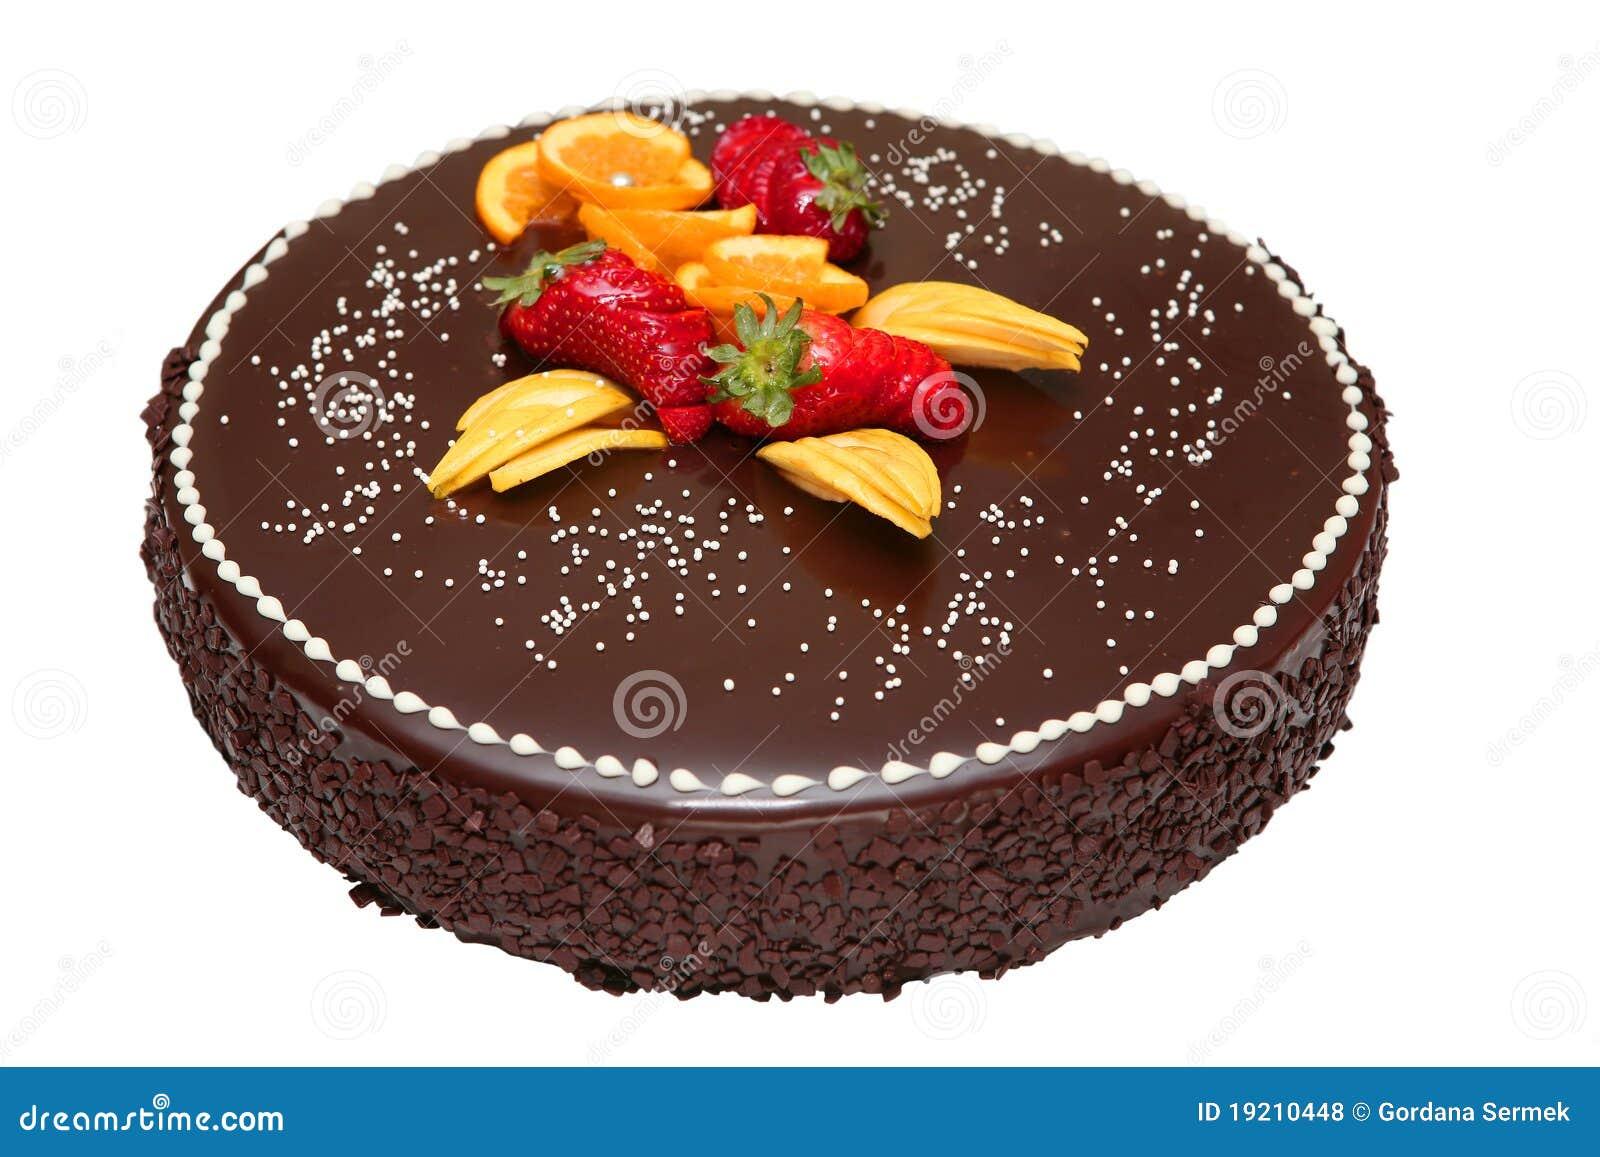 Bosco Chocolate Cake